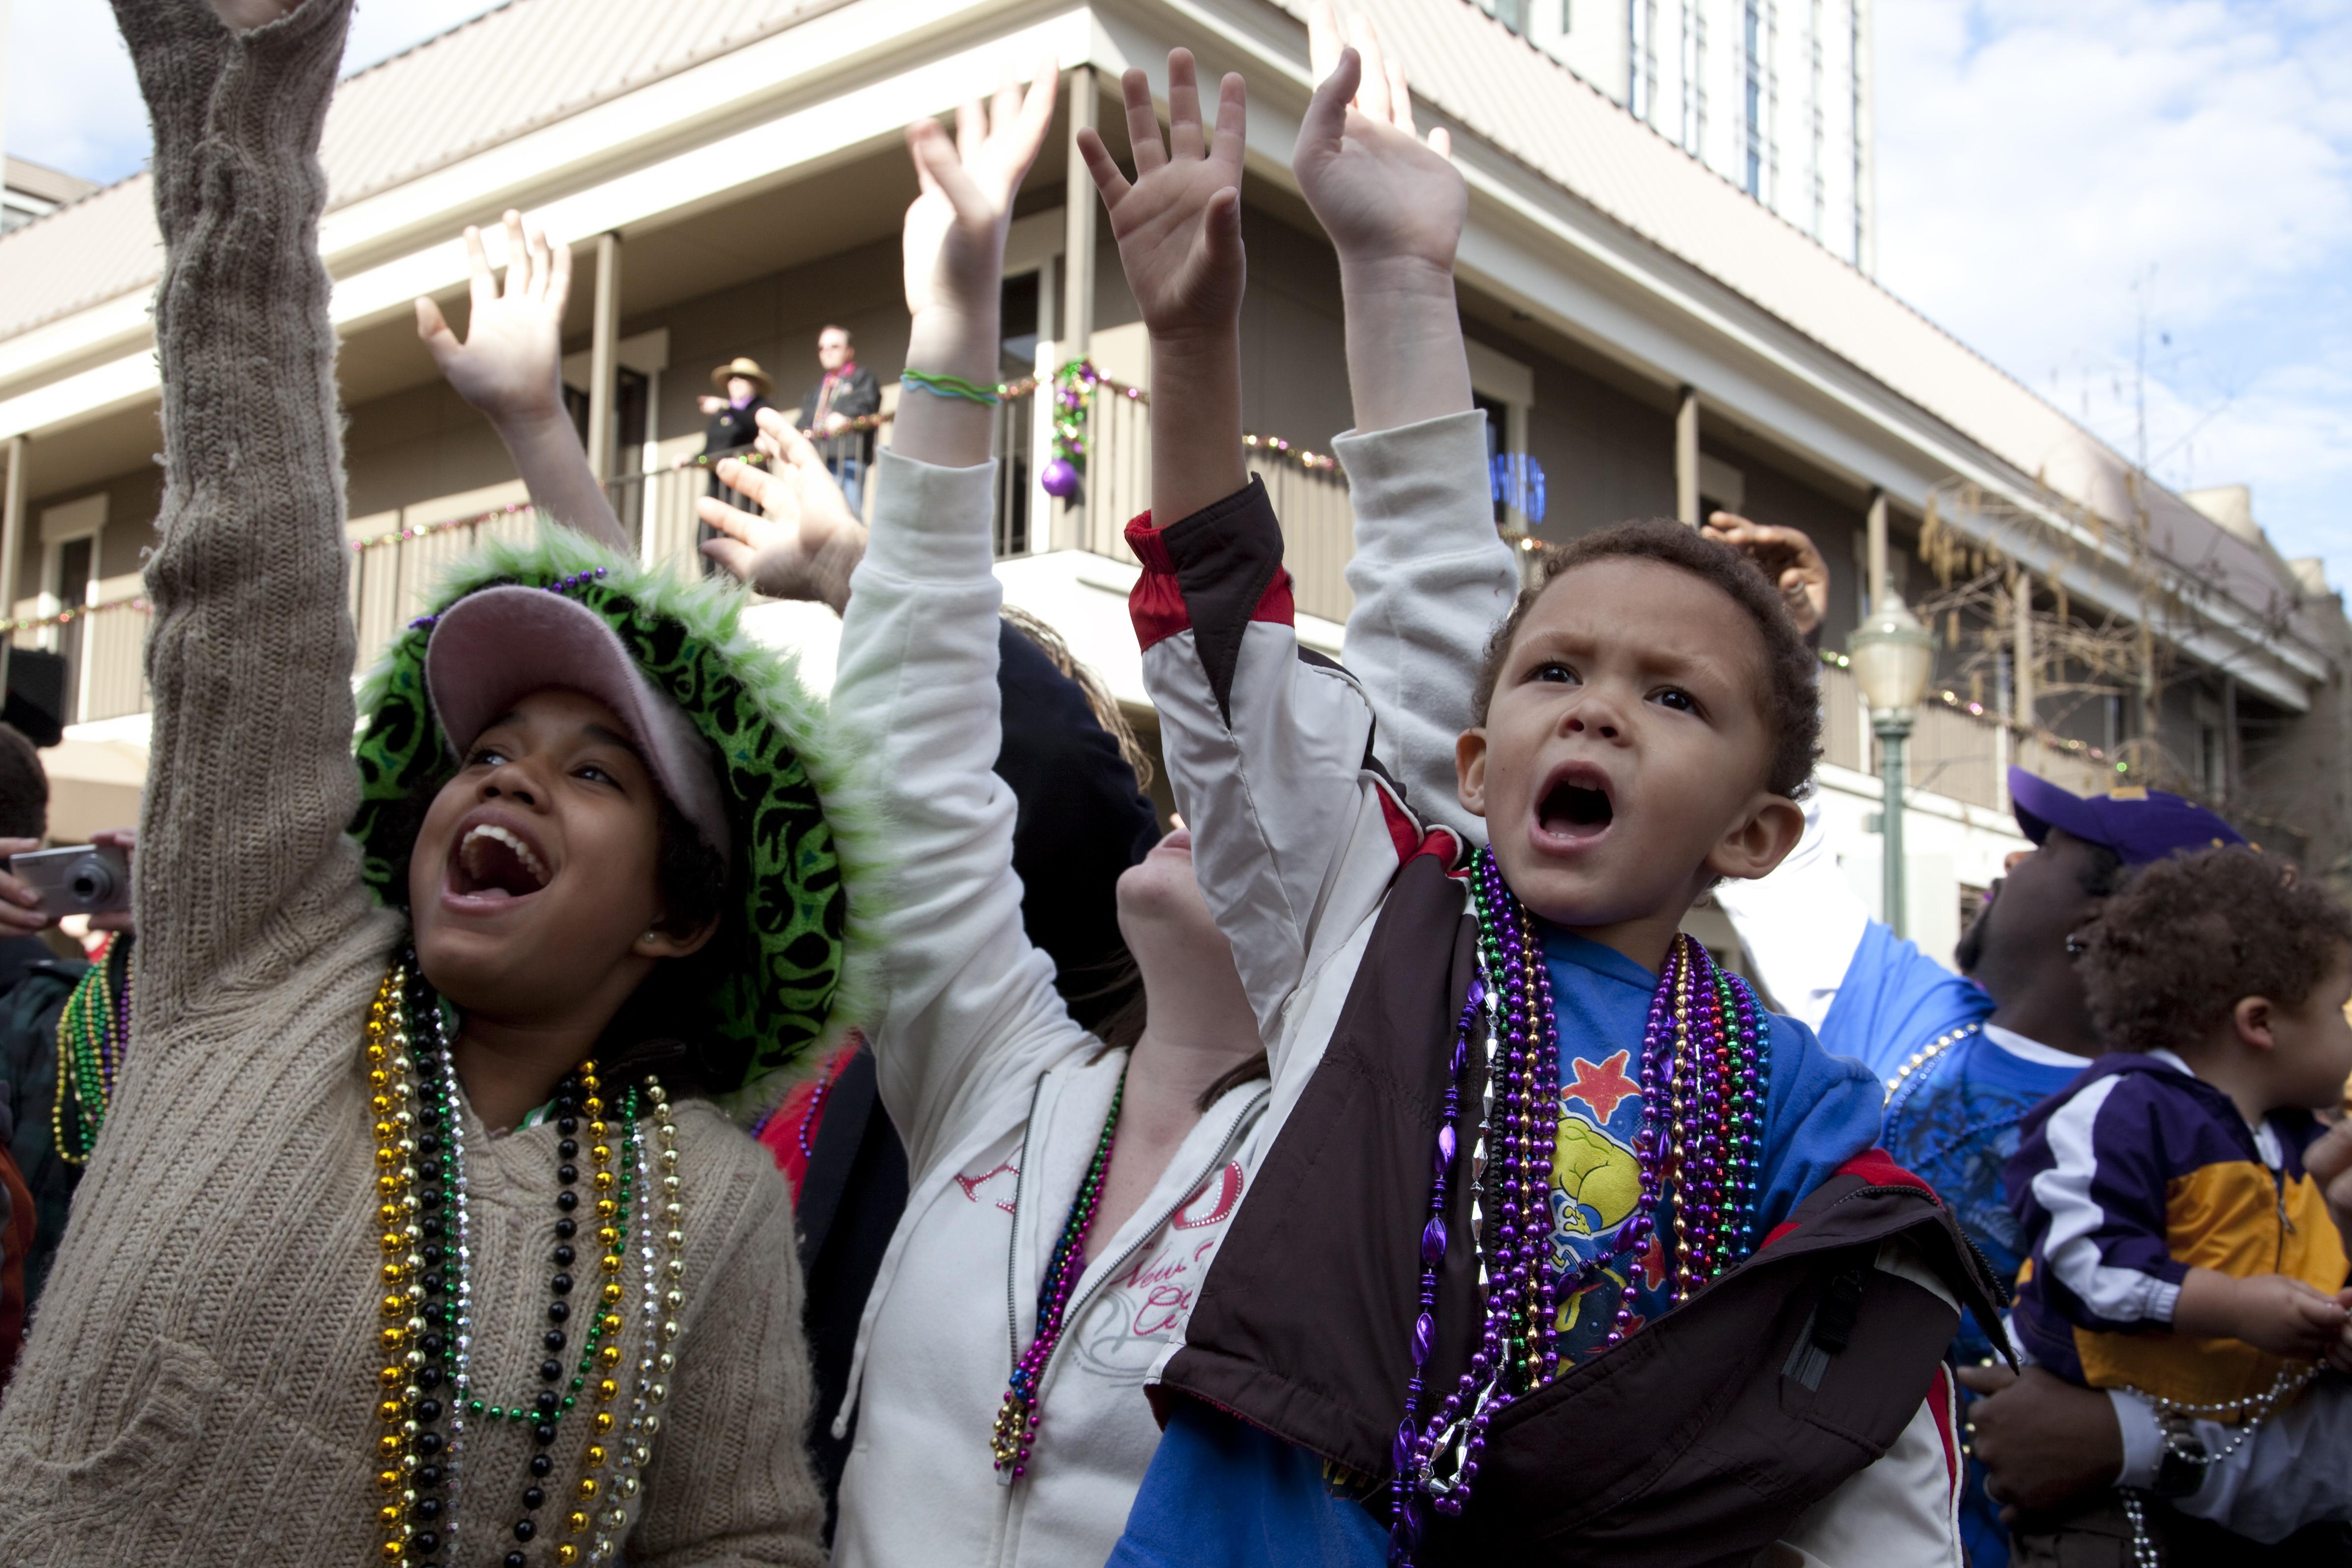 Spectators, Mardi Gras, Mobile, Alabama